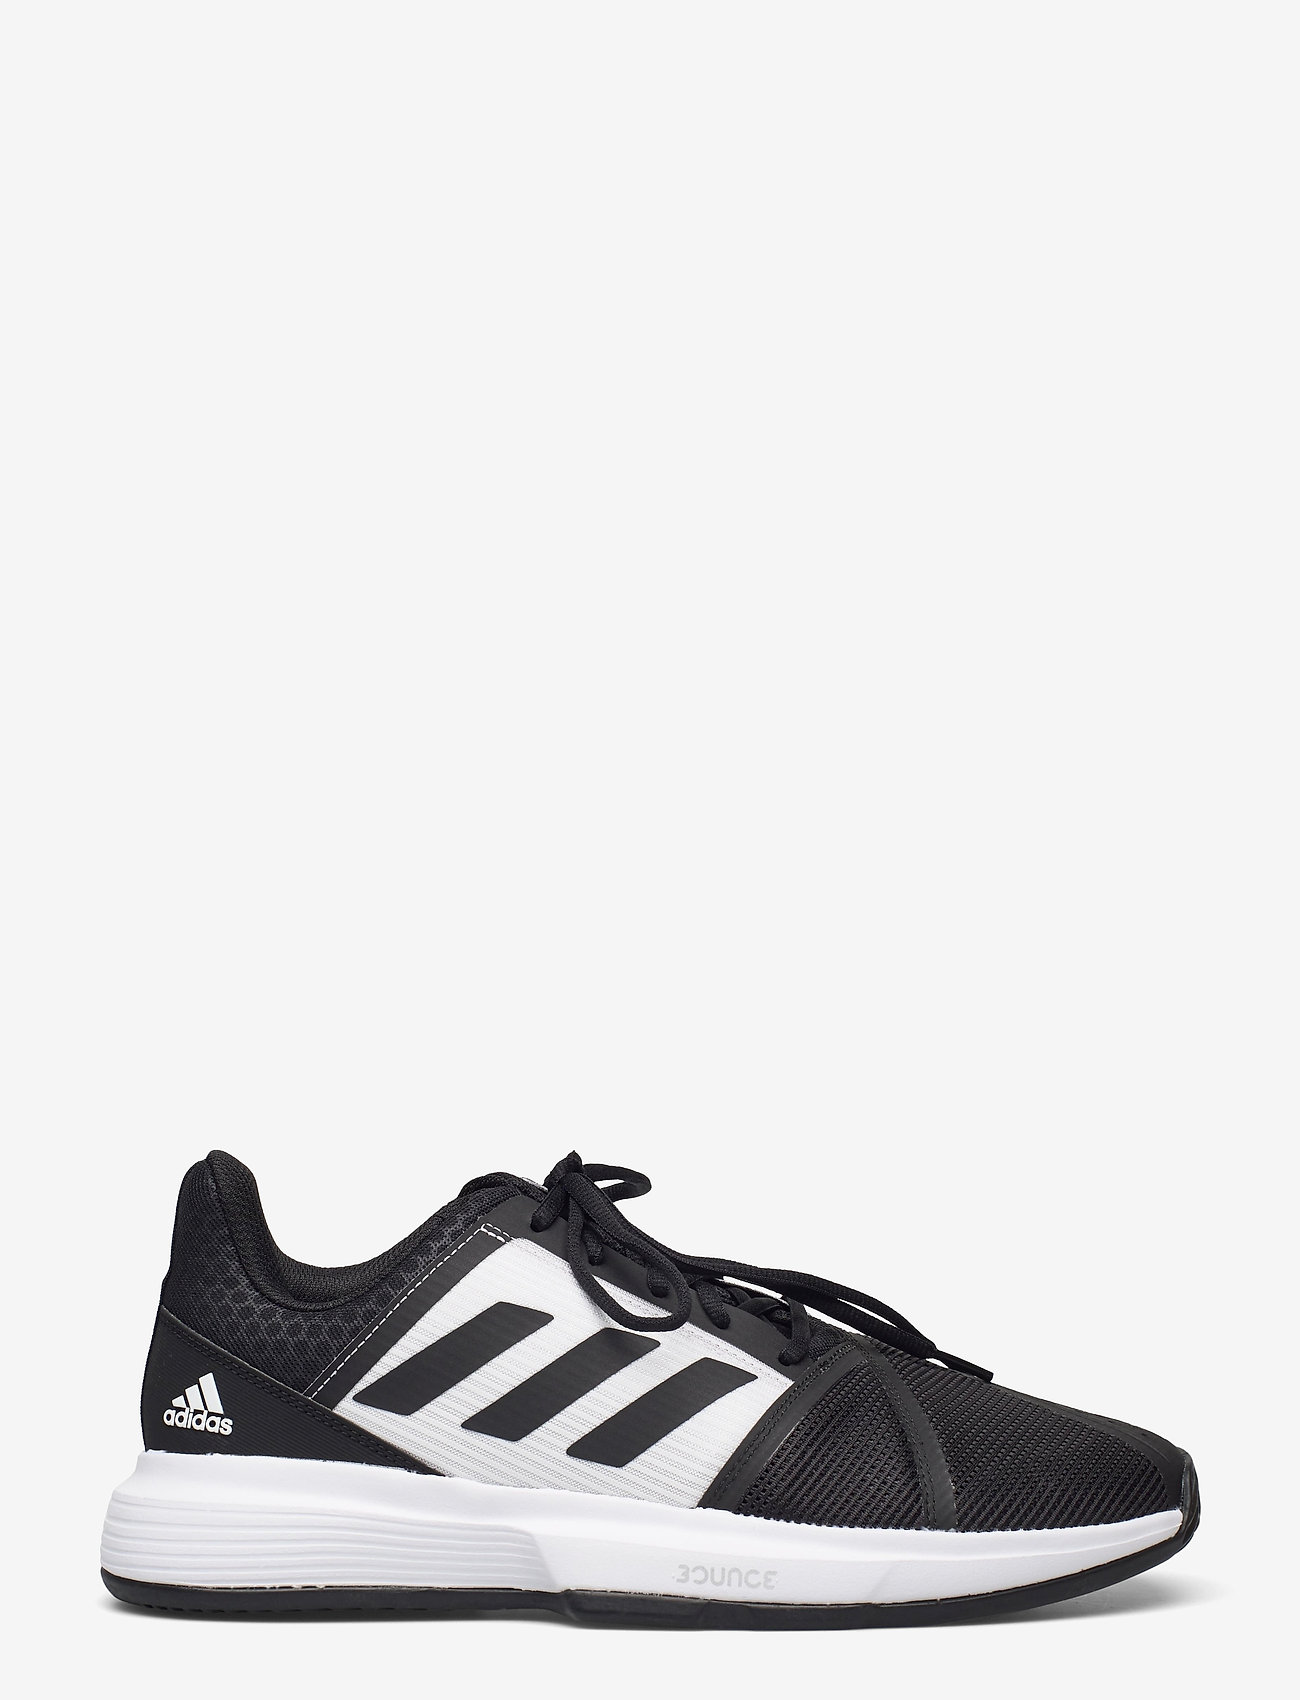 adidas Performance - COURTJAM BOUNCE M CLAY - ketsjersportsko - 000/black - 1